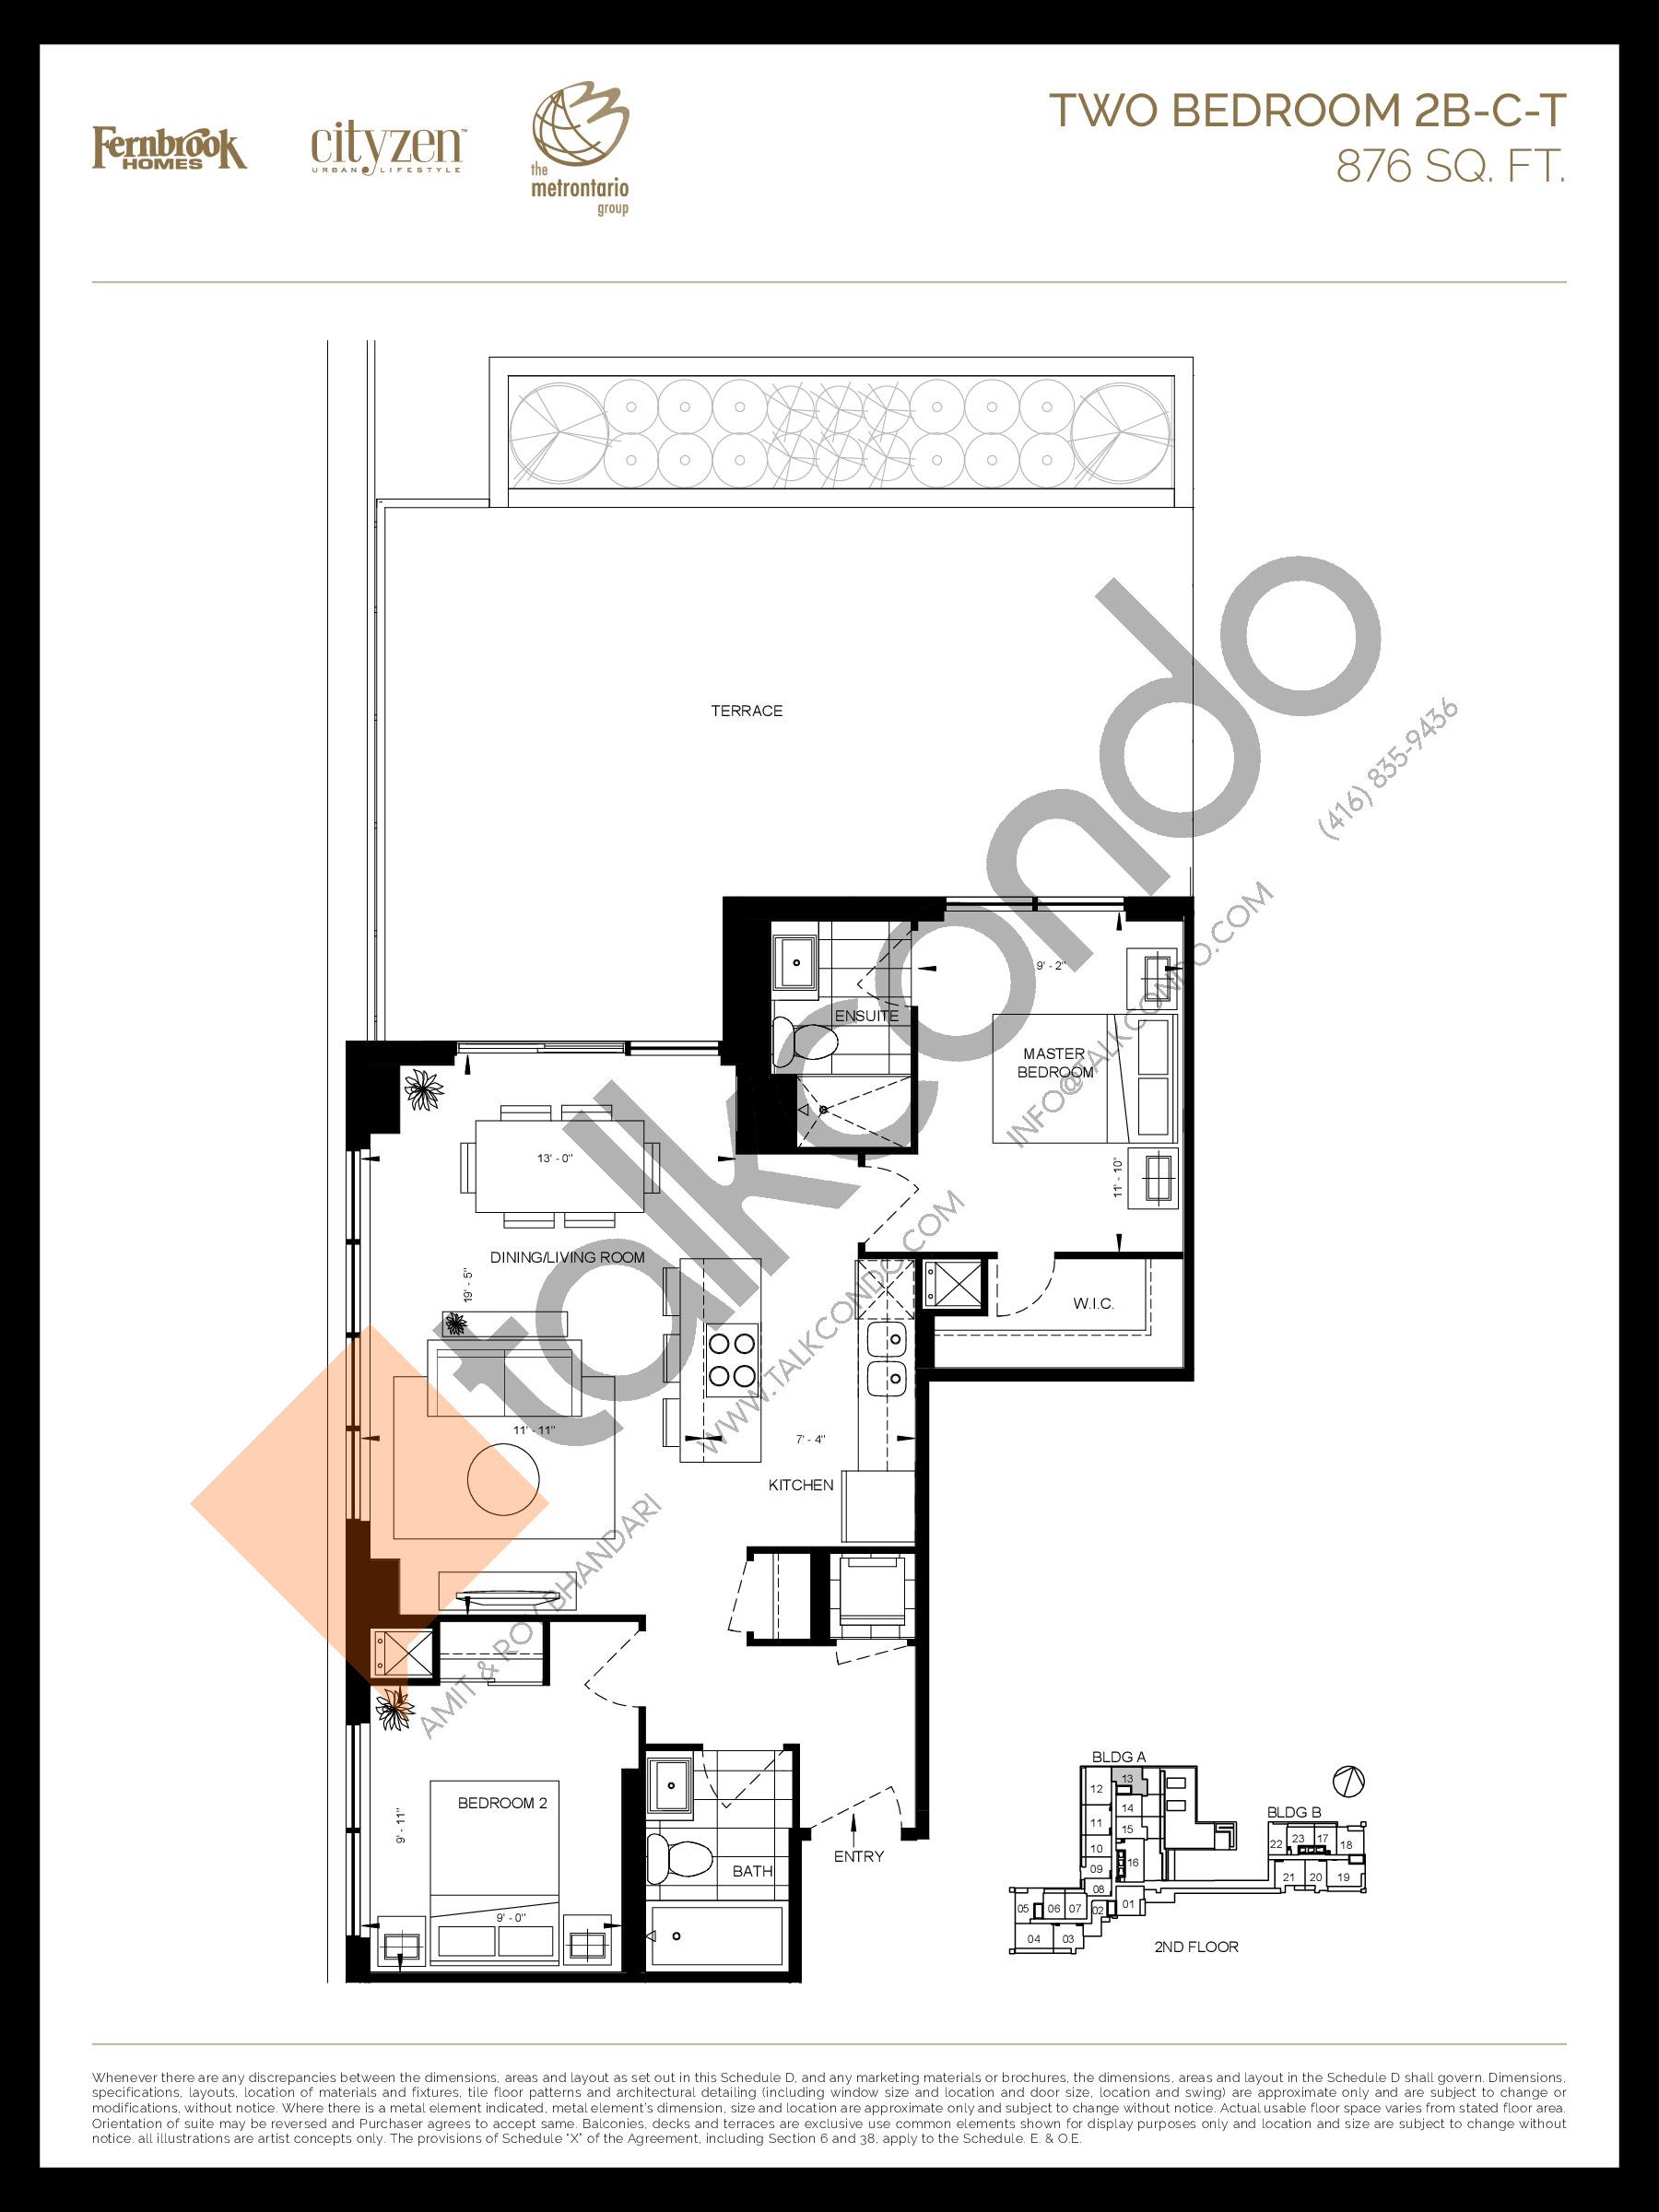 2B-C-T Floor Plan at D'or Condos - 876 sq.ft